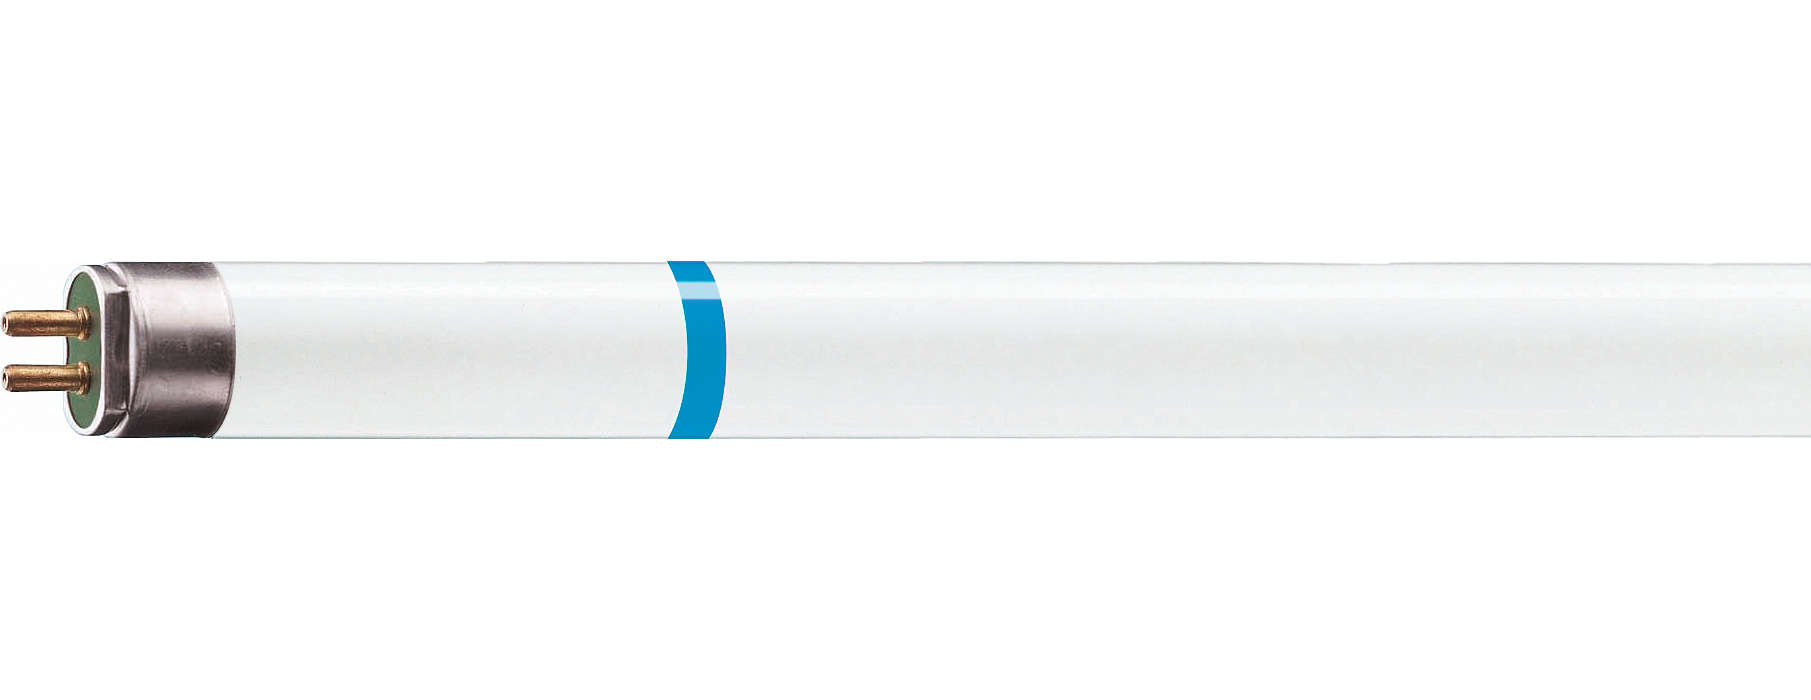 Shatterfree fluorescent lighting